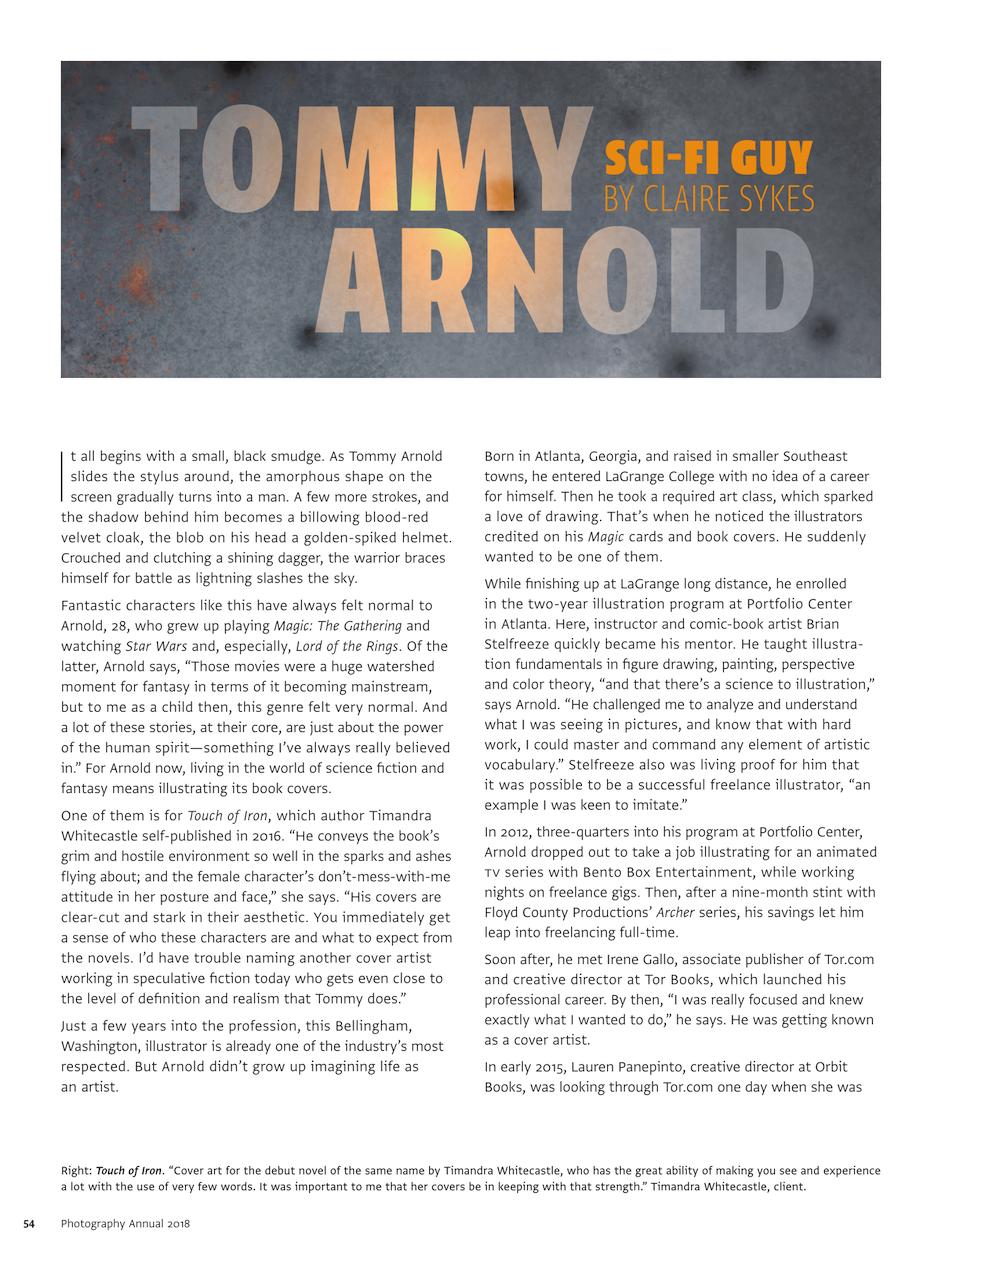 TommyArnold-2.png